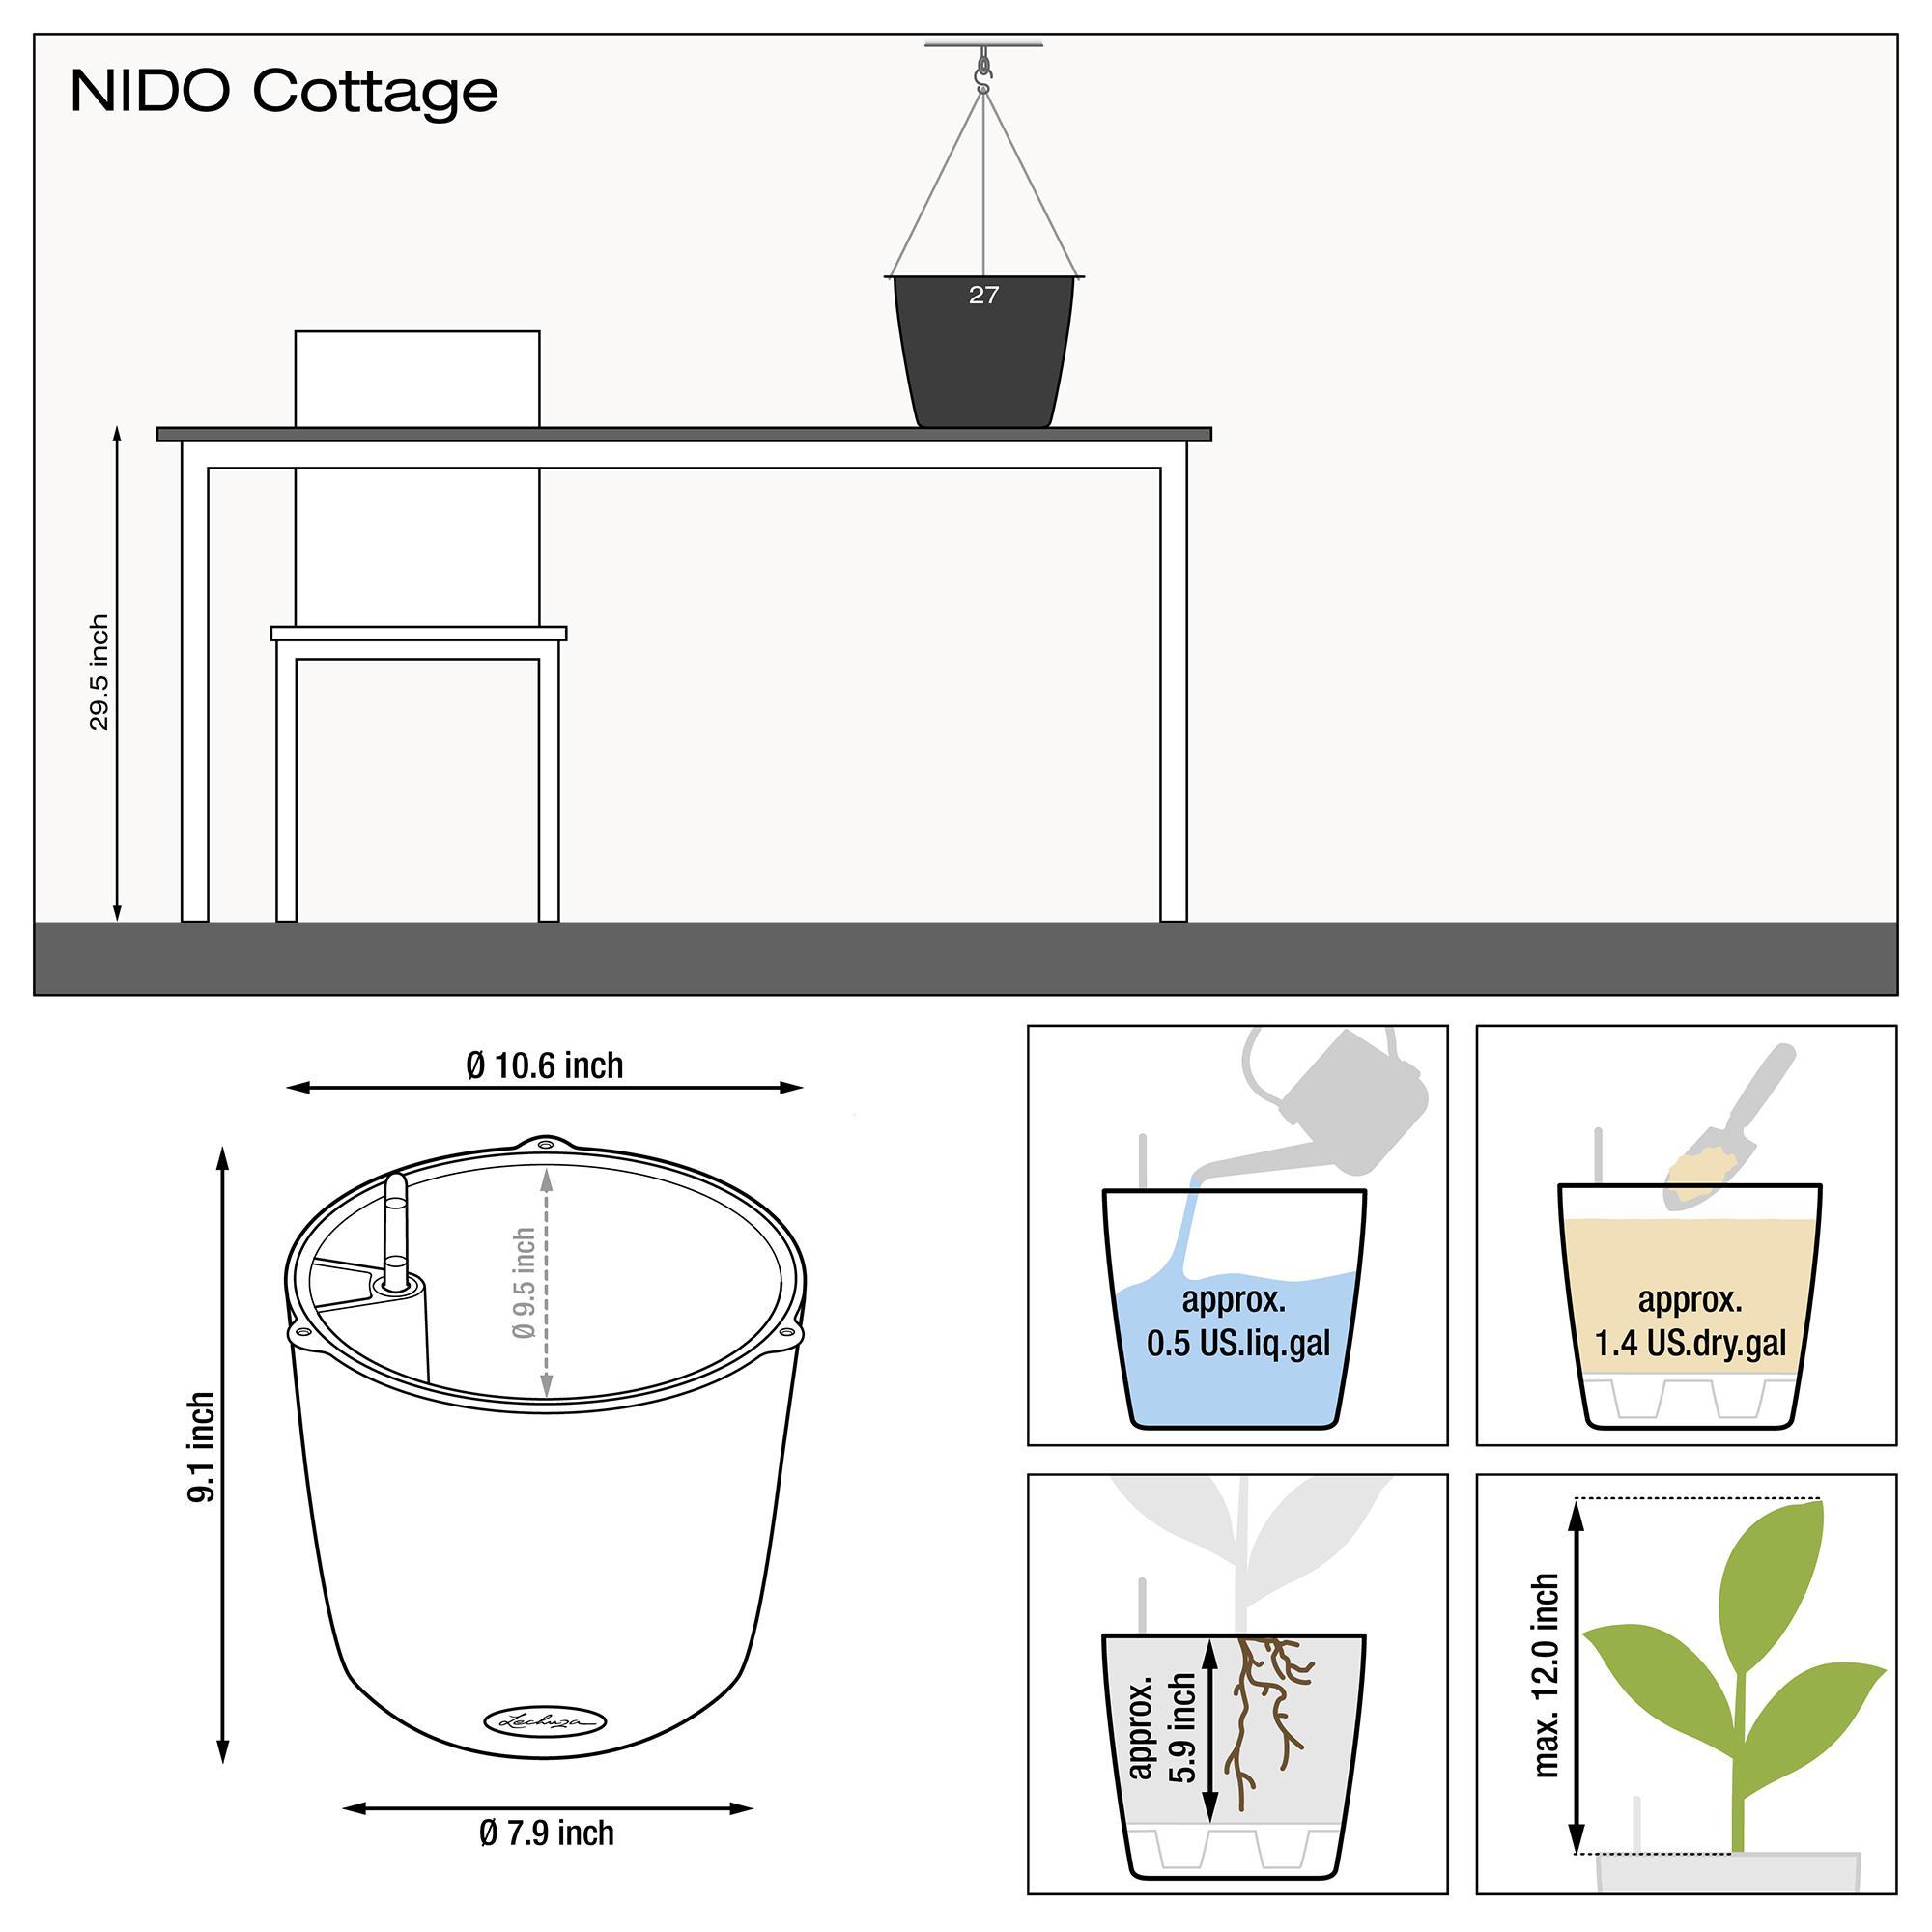 le_nido-cottage_product_addi_nz_us